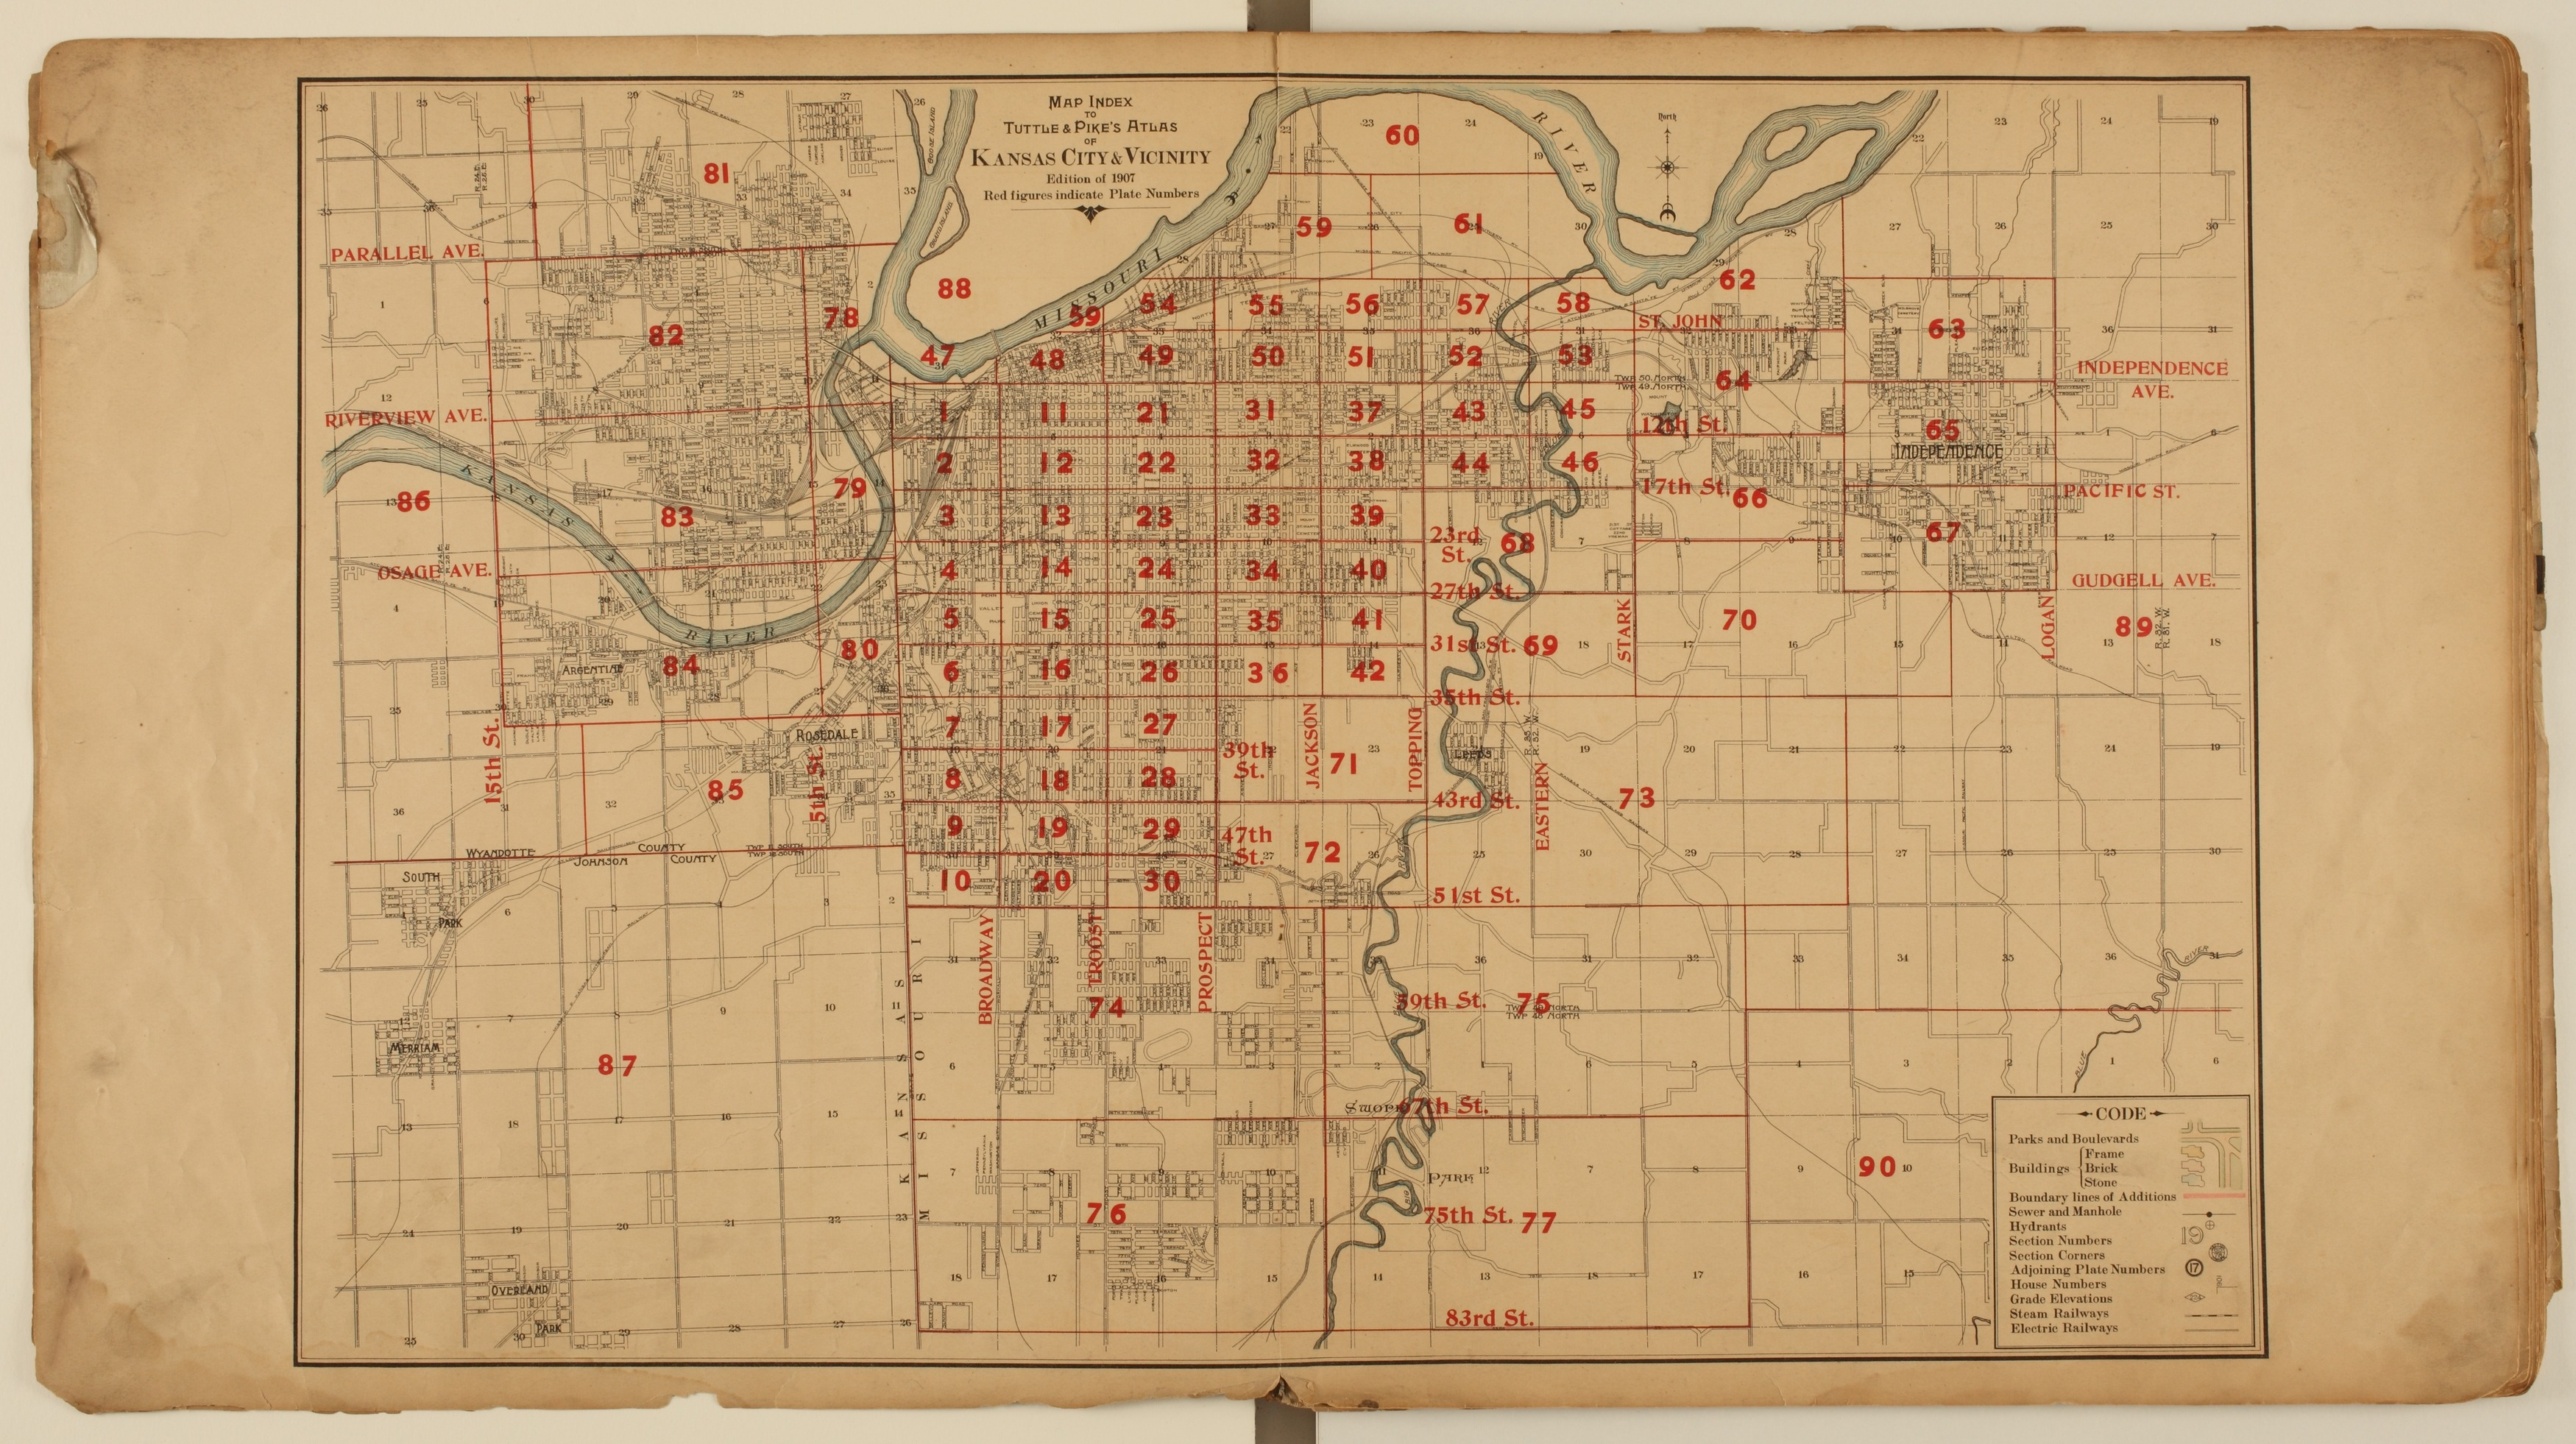 Tuttle and Pike's atlas of Kansas City, Kansas - 3